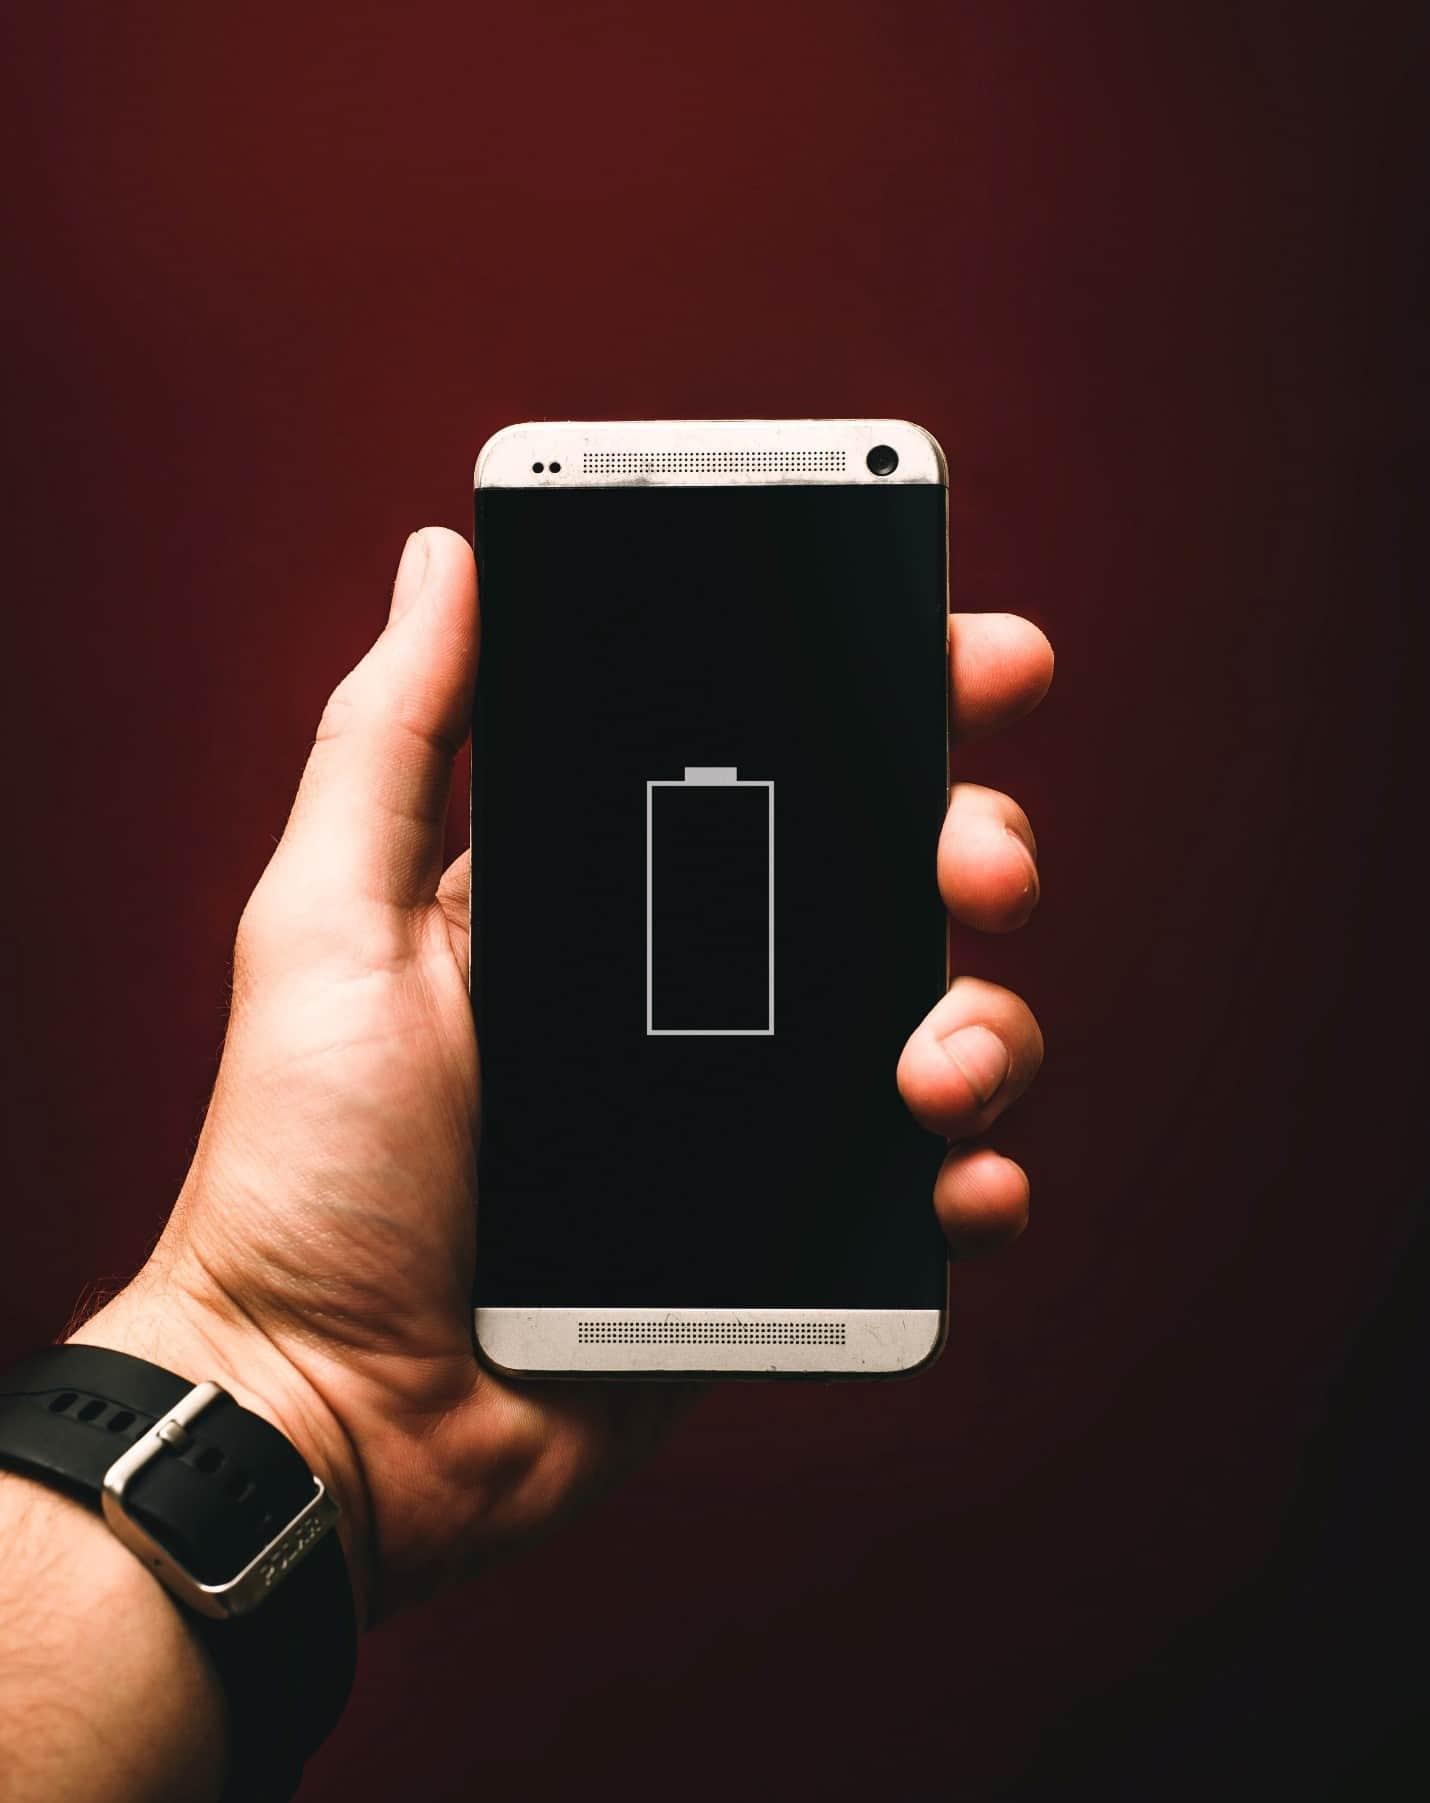 content/de-de/images/repository/isc/2020/9910/prolong-your-smartphone-battery-lifespan-1.jpg